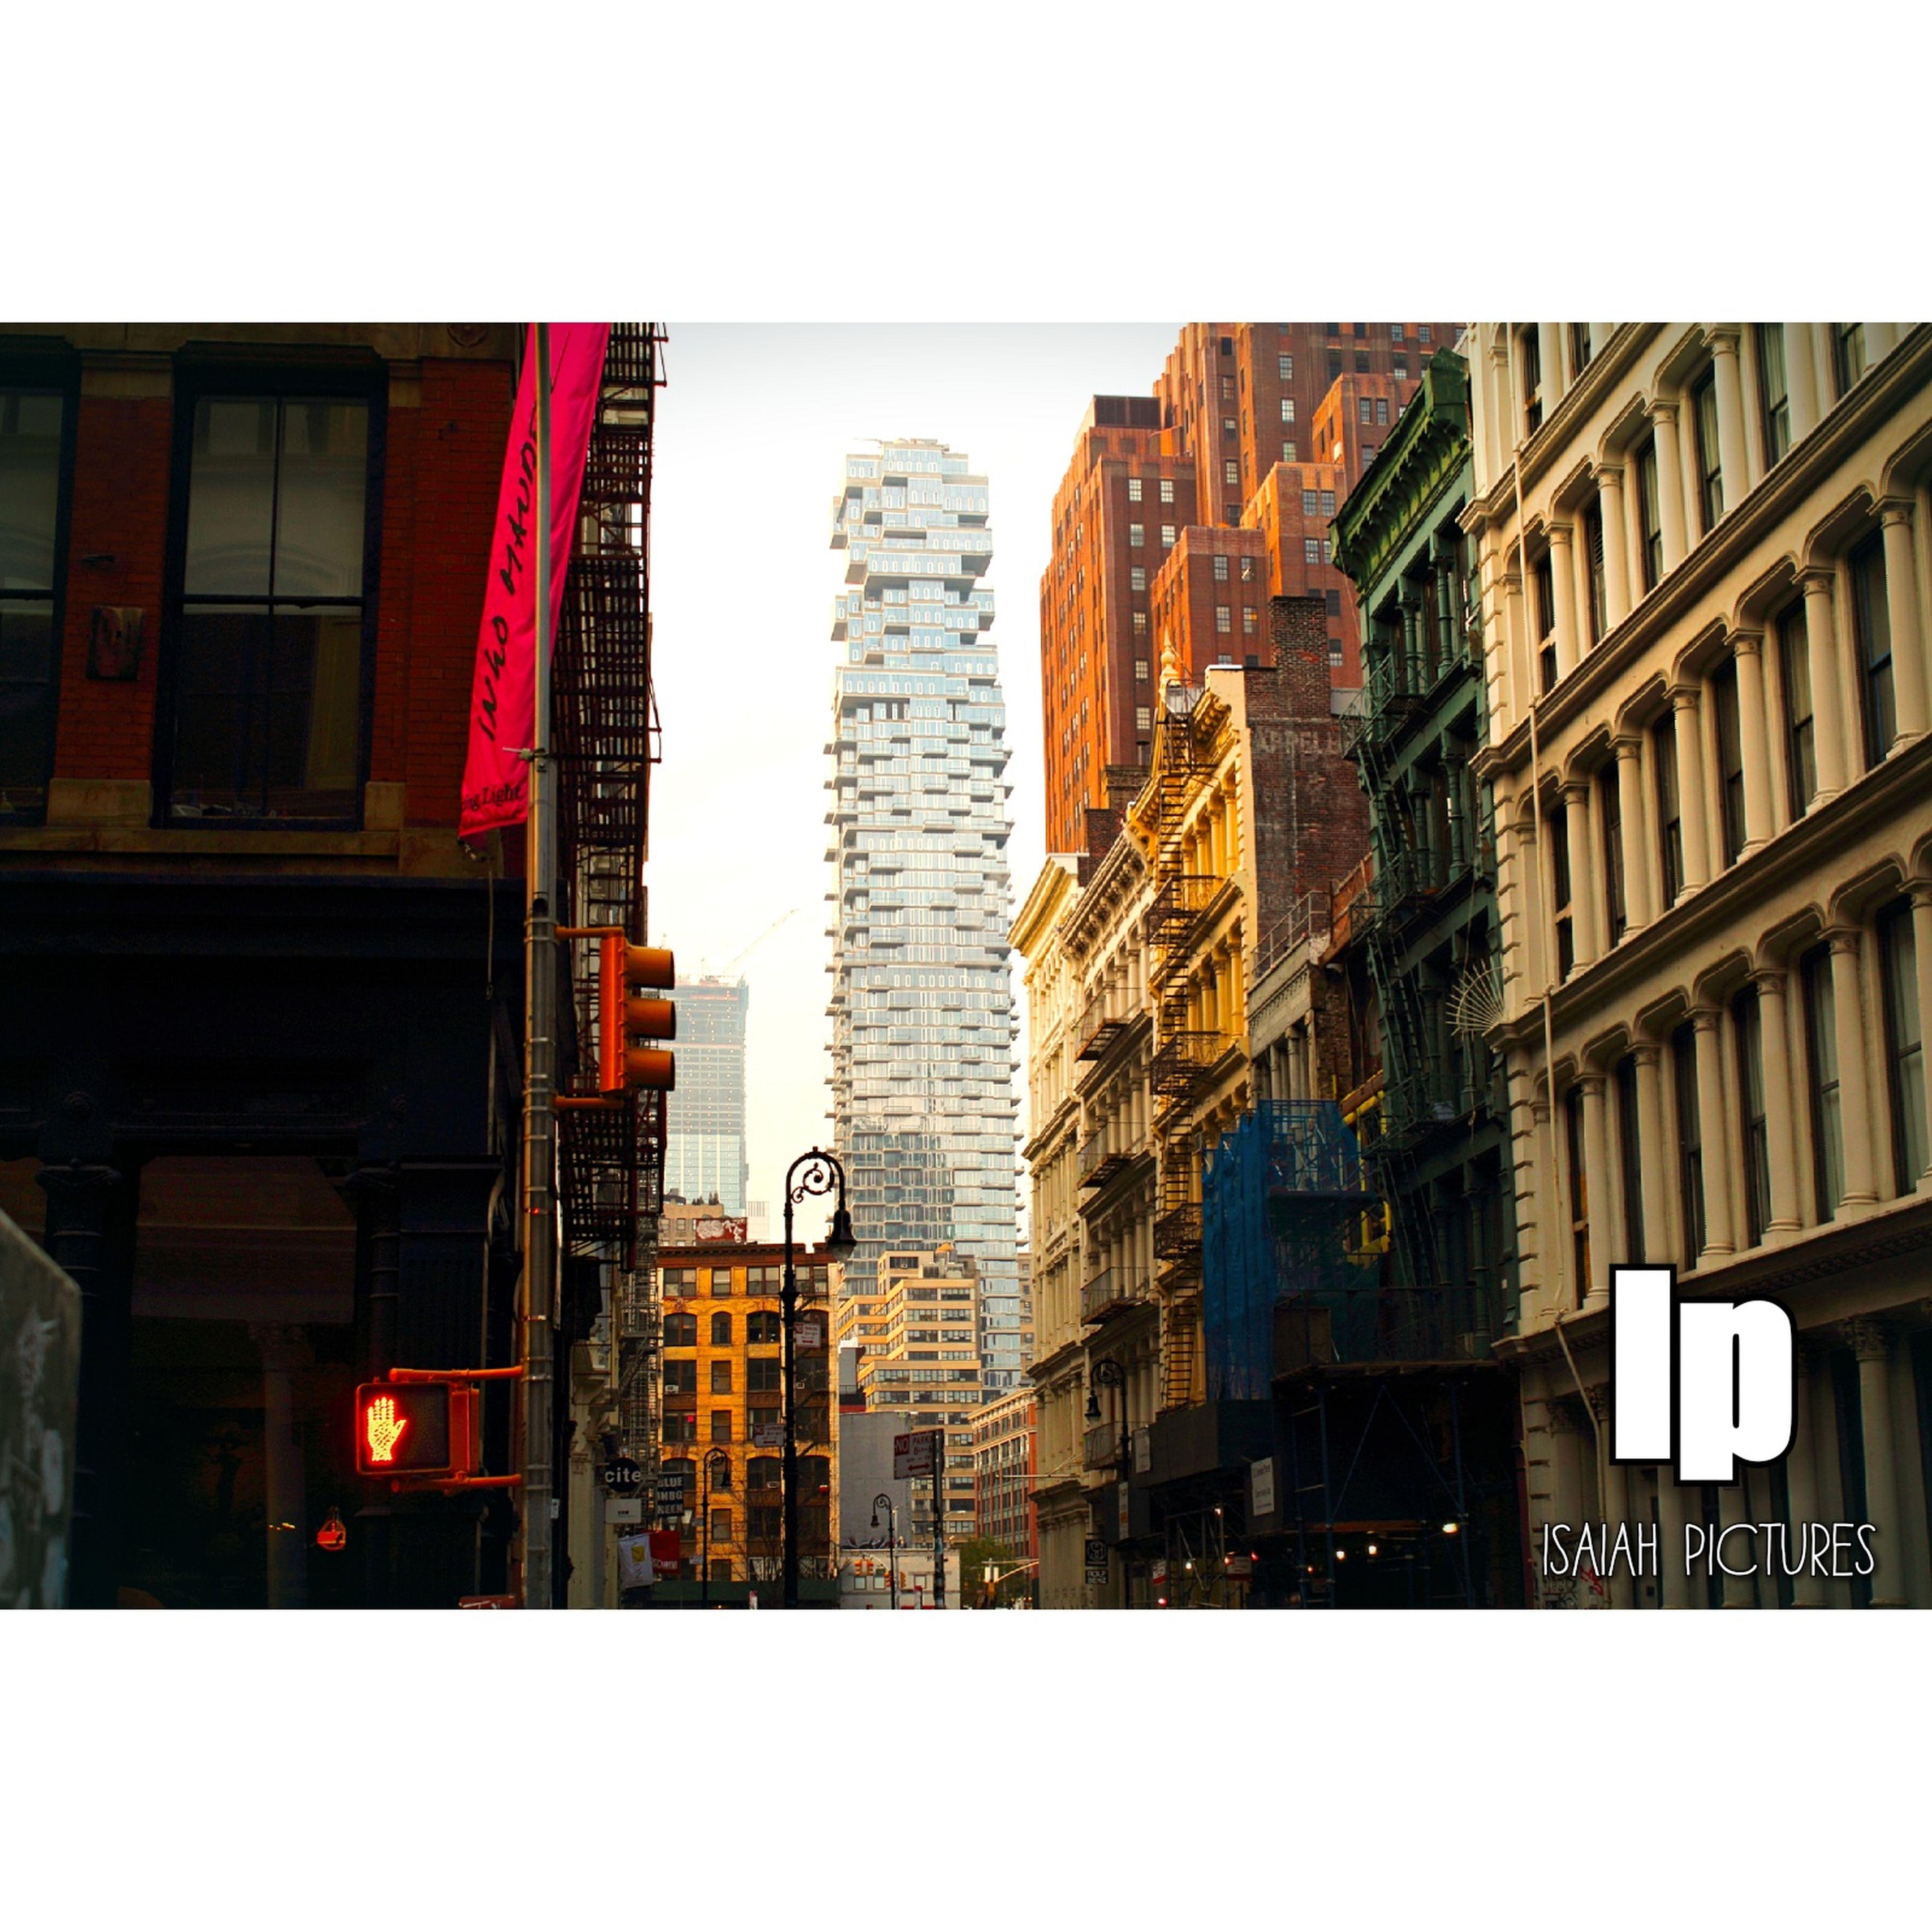 building exterior, architecture, built structure, city, skyscraper, travel destinations, outdoors, sky, city life, apartment, no people, cityscape, day